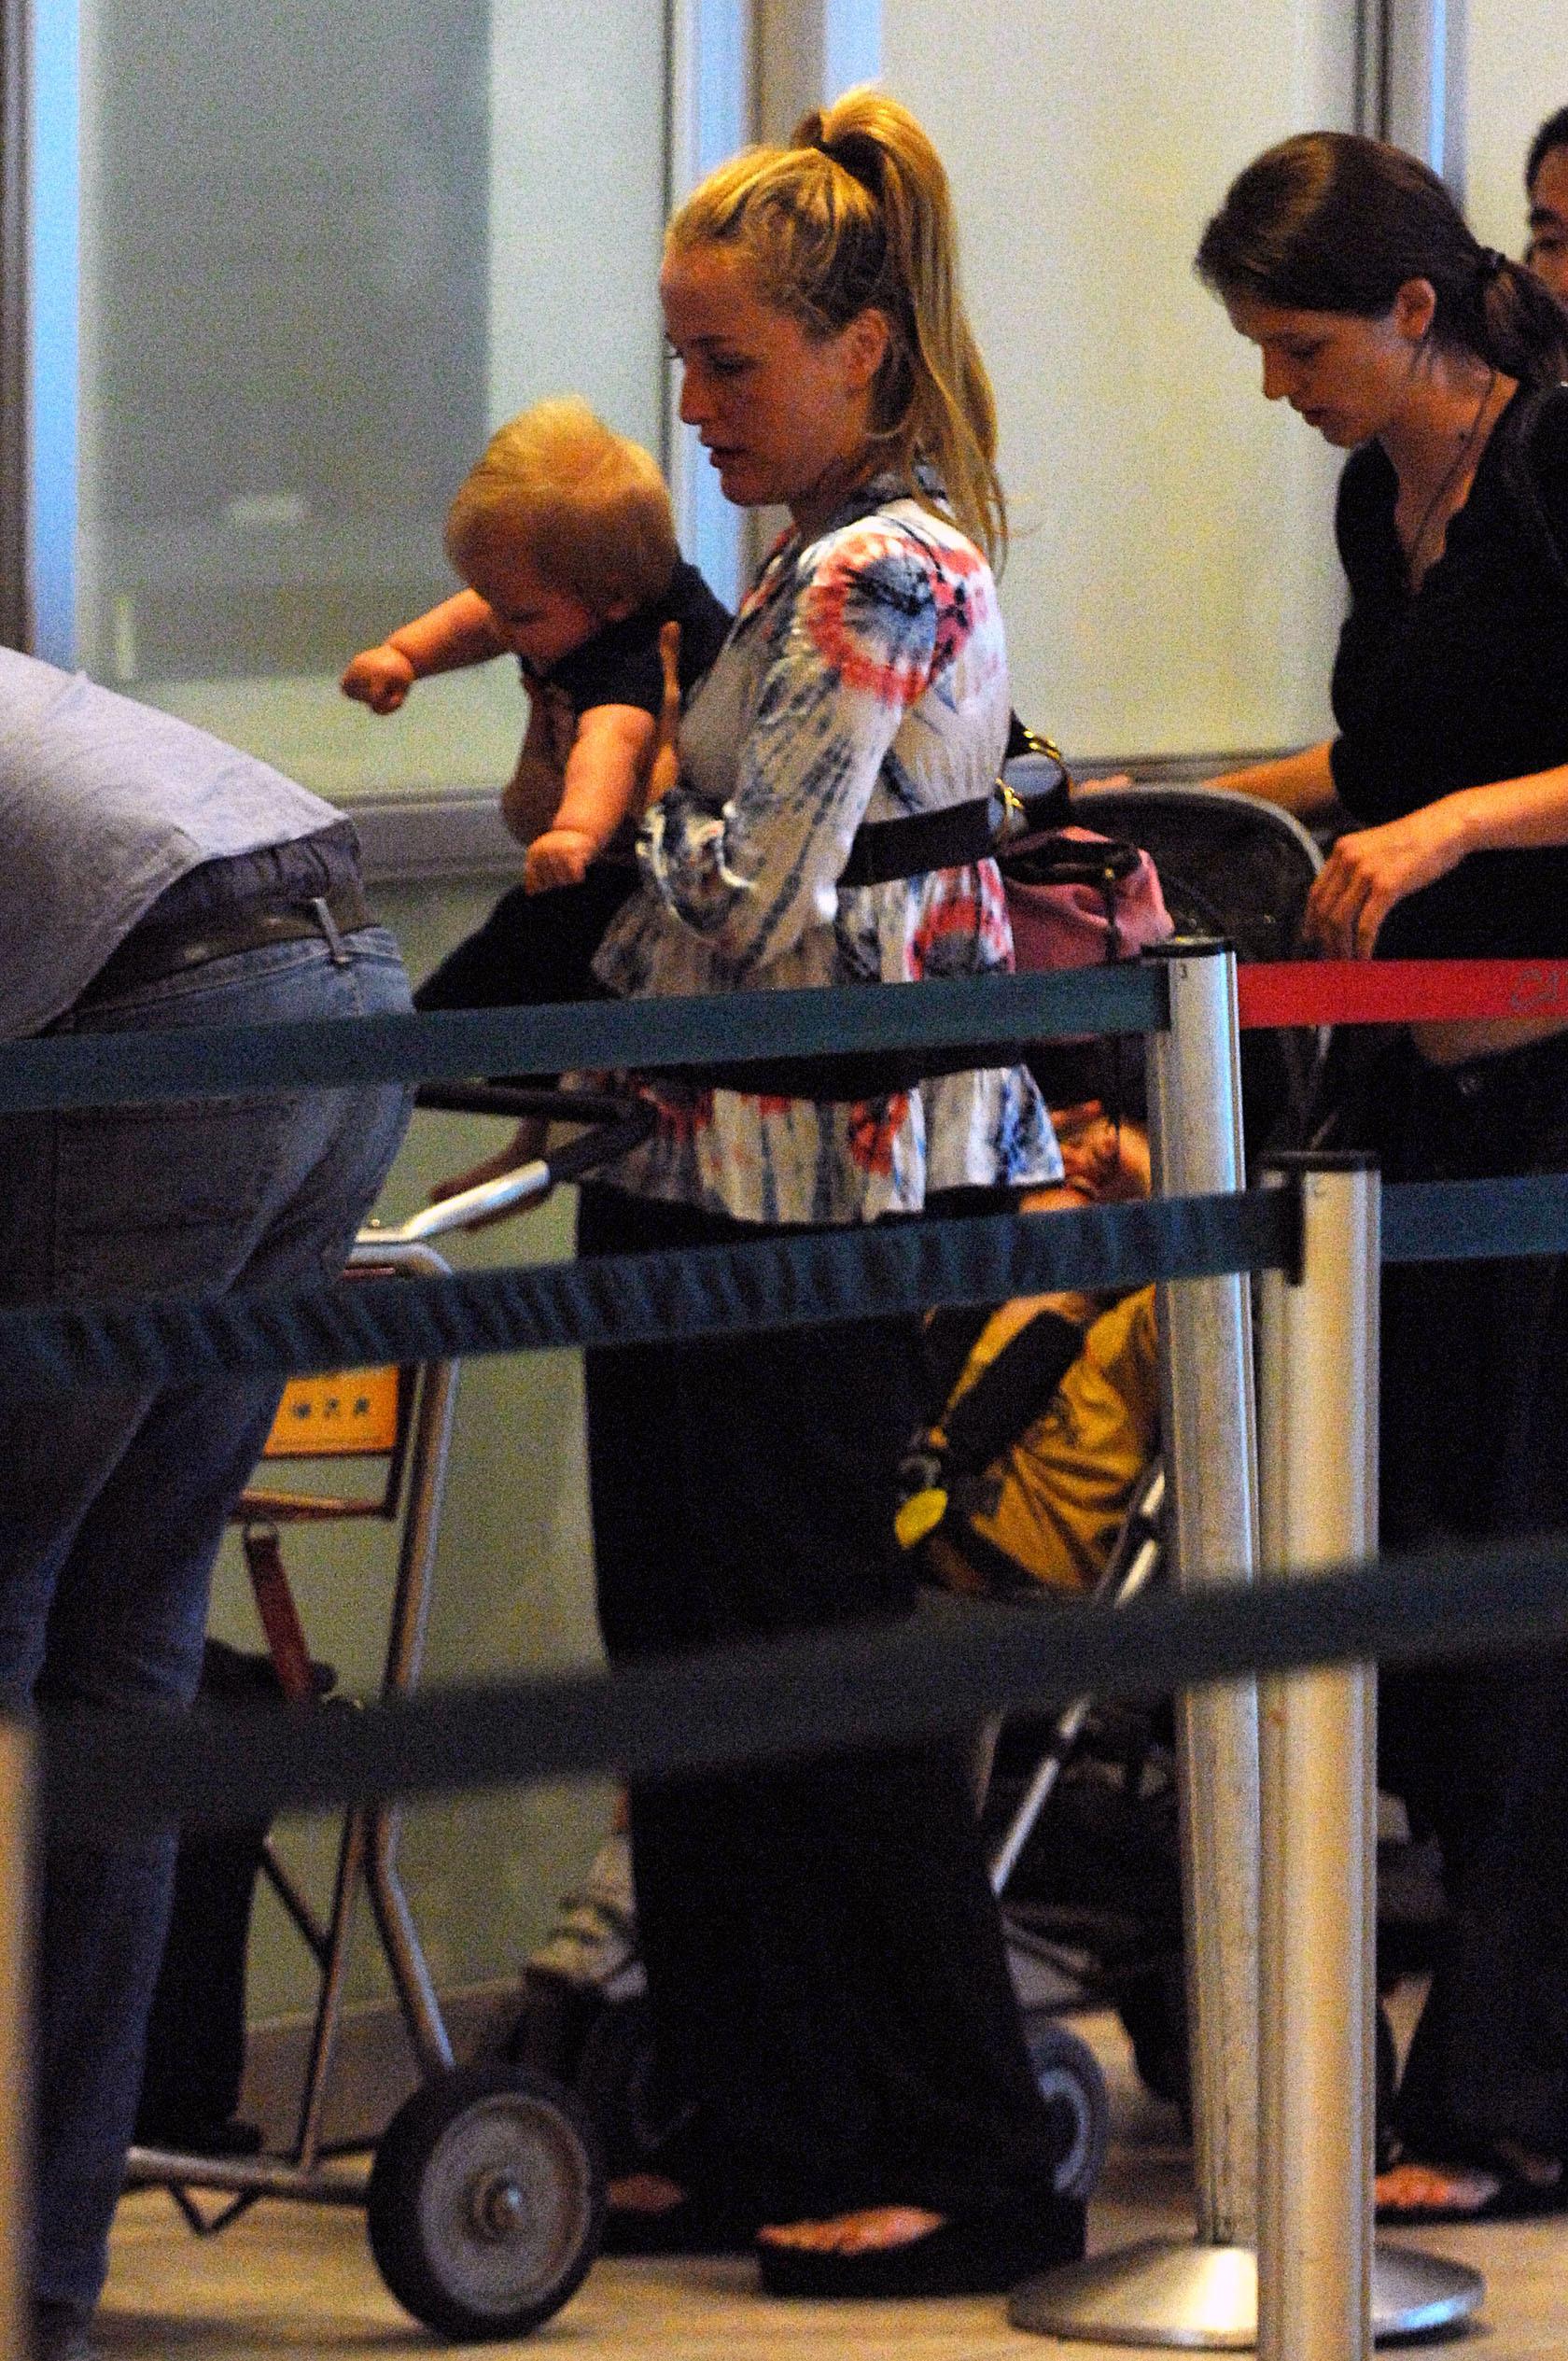 gillian airport vancouver